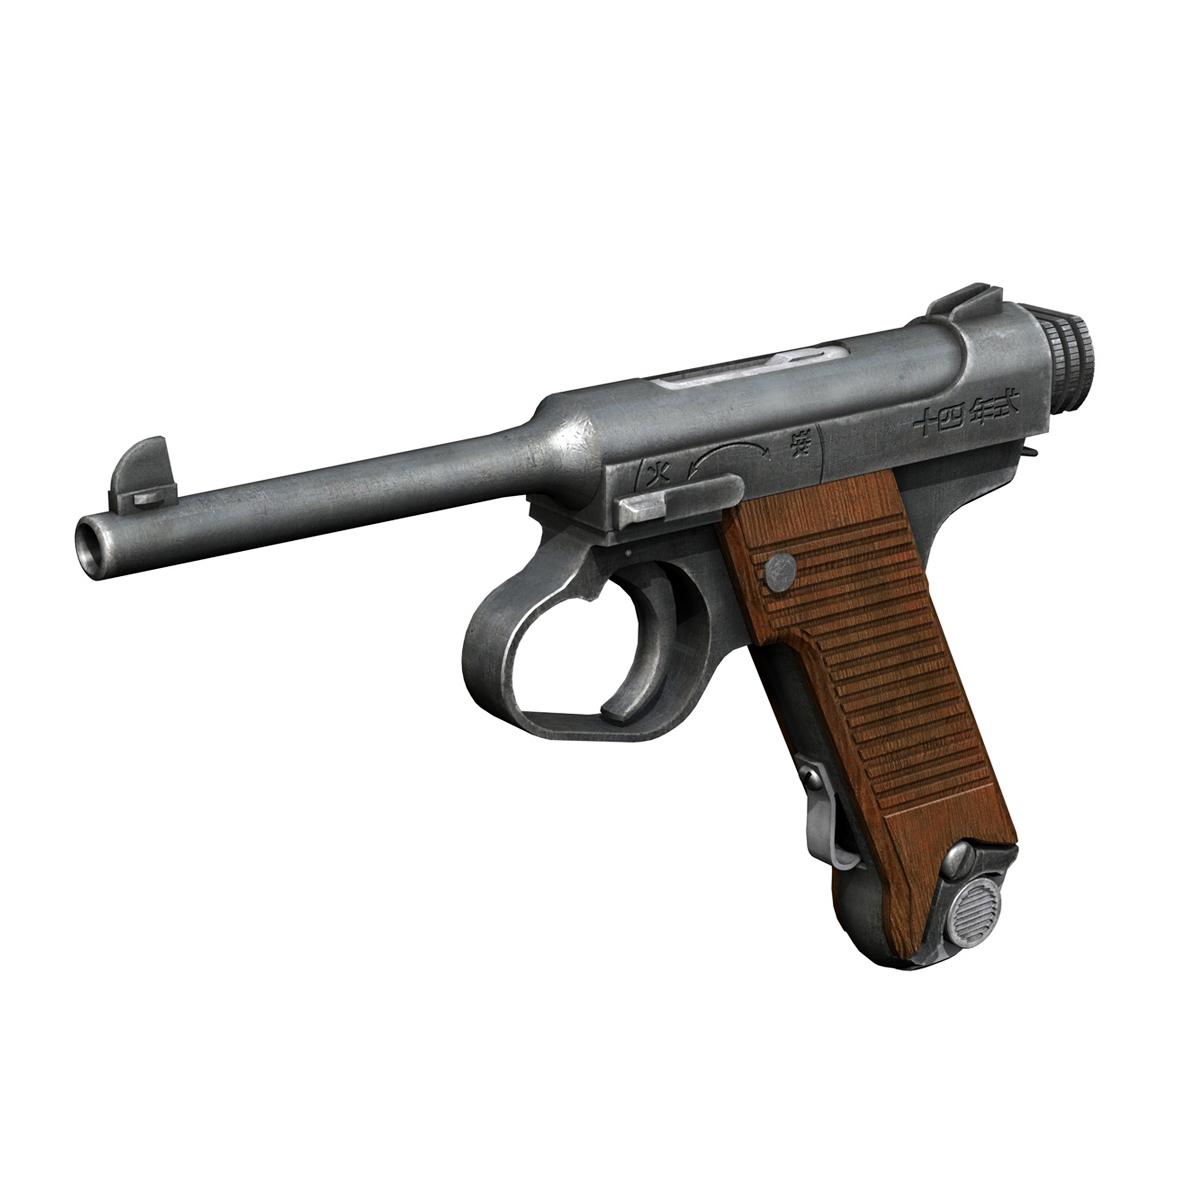 Nambu pištolj tip 14 3d model 3ds fbx c4d lwo obj 195152